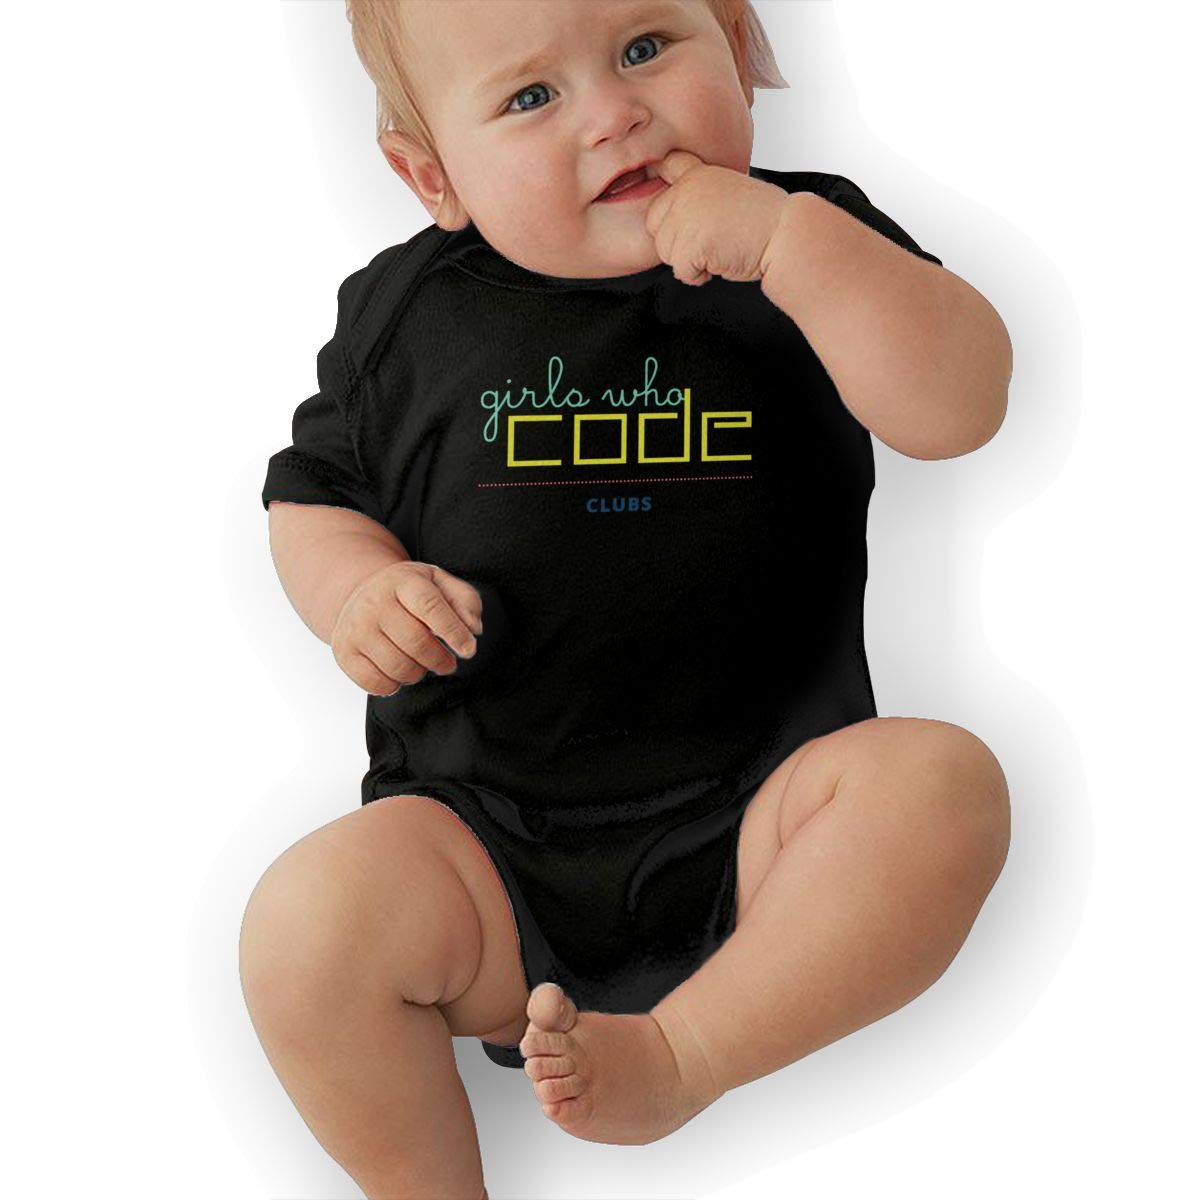 LANBRELLA Little Girls/&Boys Kid Girls Who Code Clubs Cotton Crew Neck Short Sleeves T-Shirts Tops